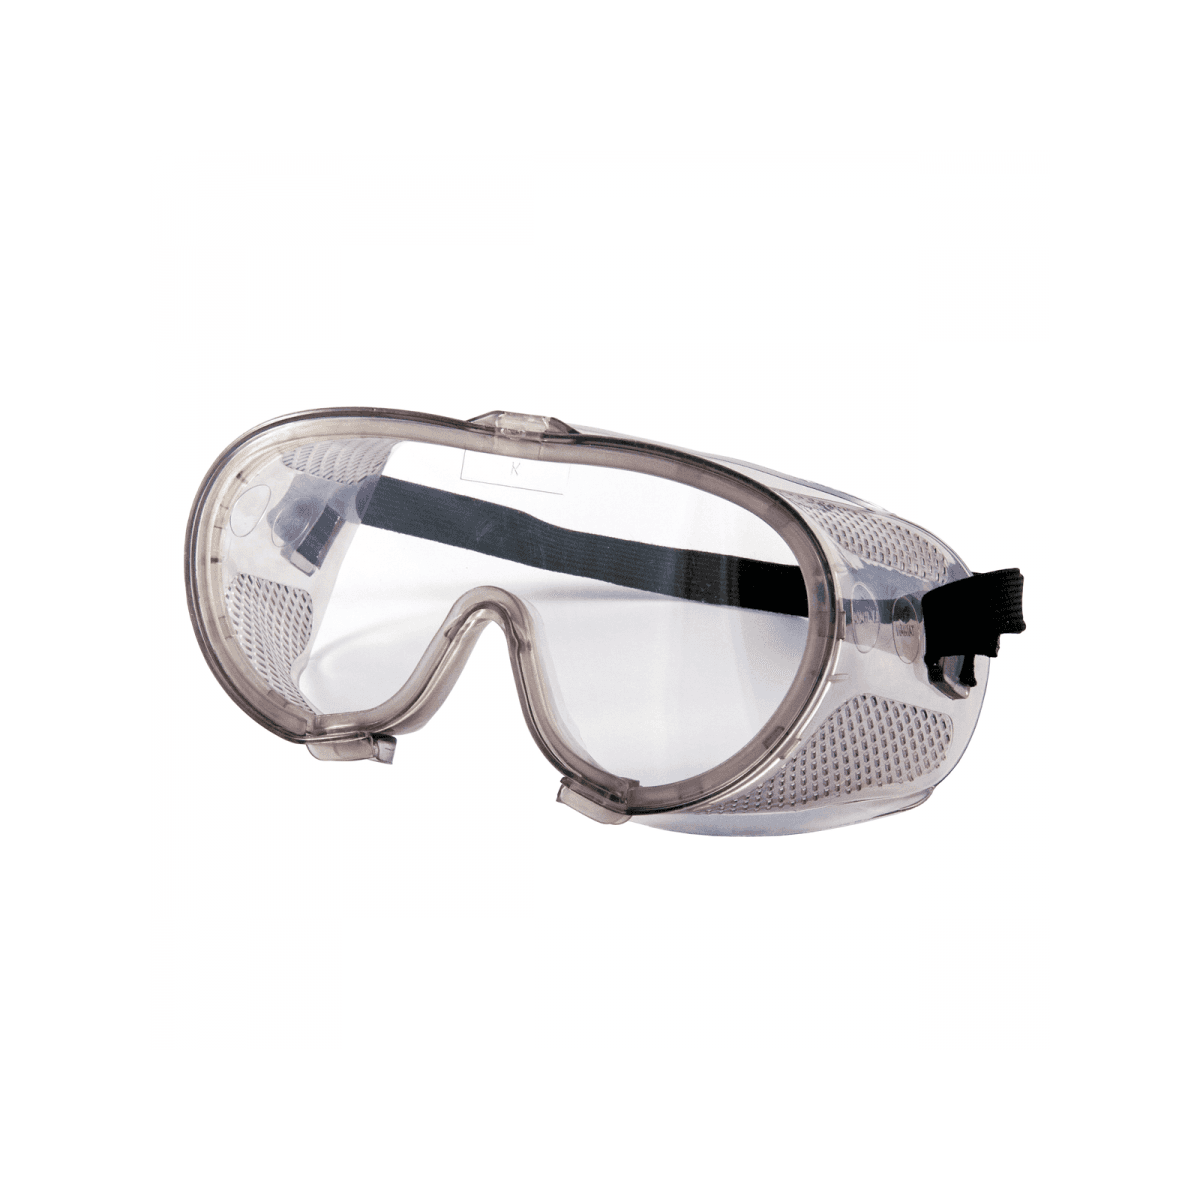 Oculos Protecao Incolor Ampla Visao com Elastico - Kalipso